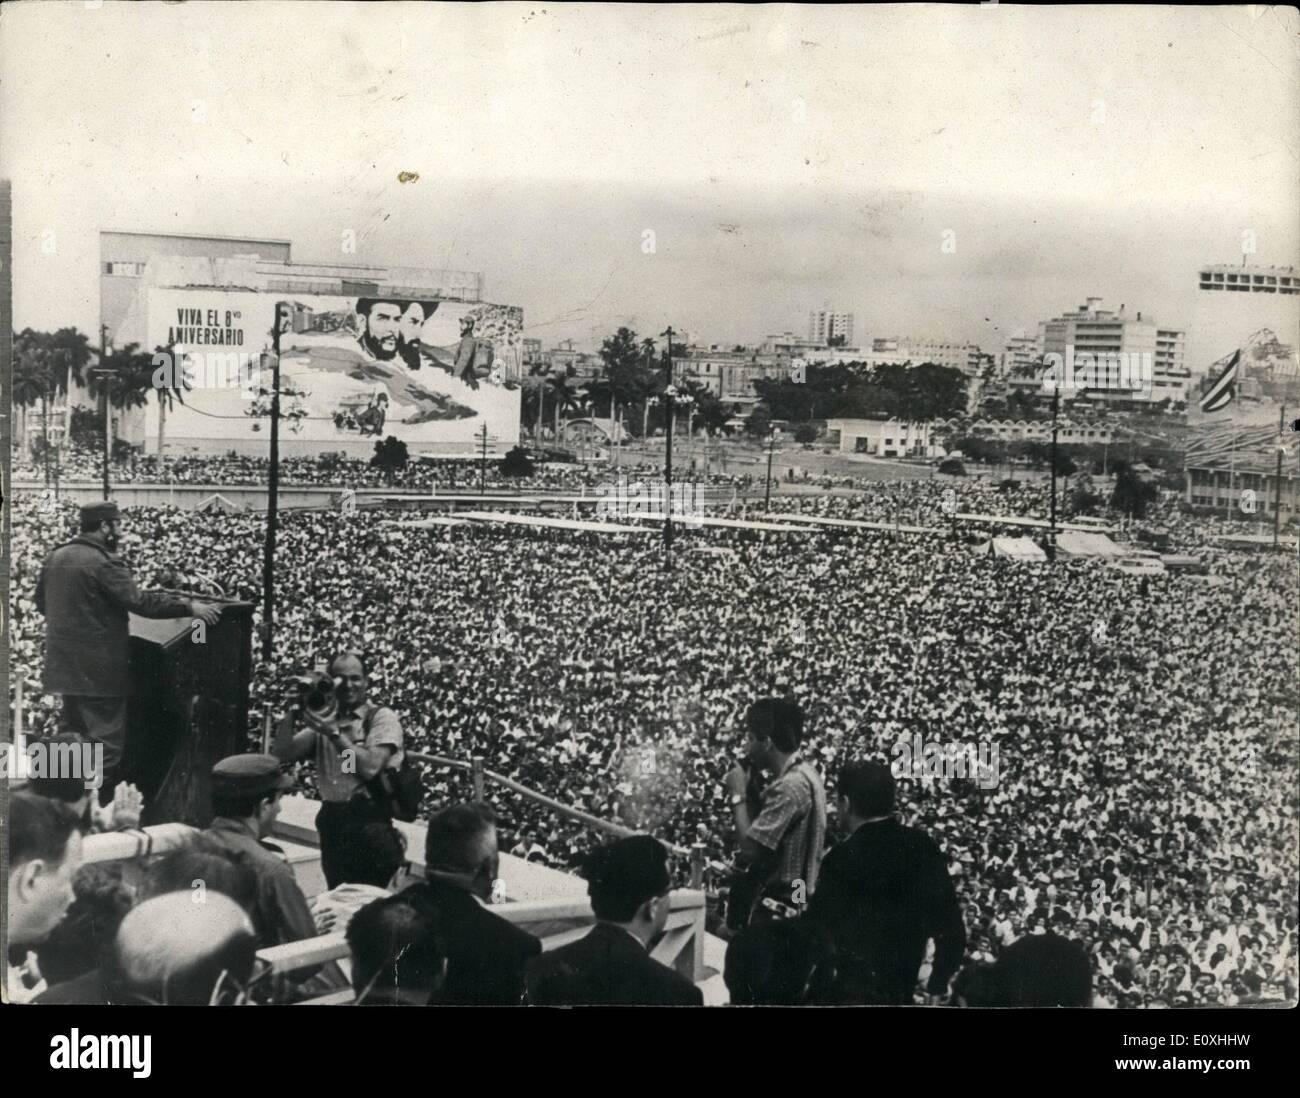 Jan. 01, 1967 - EIGHTH ANNIVERSARY OF CURAN REVOLUTION To commemorate the eighth anniversary of the Cuban Revolutions Stock Photo